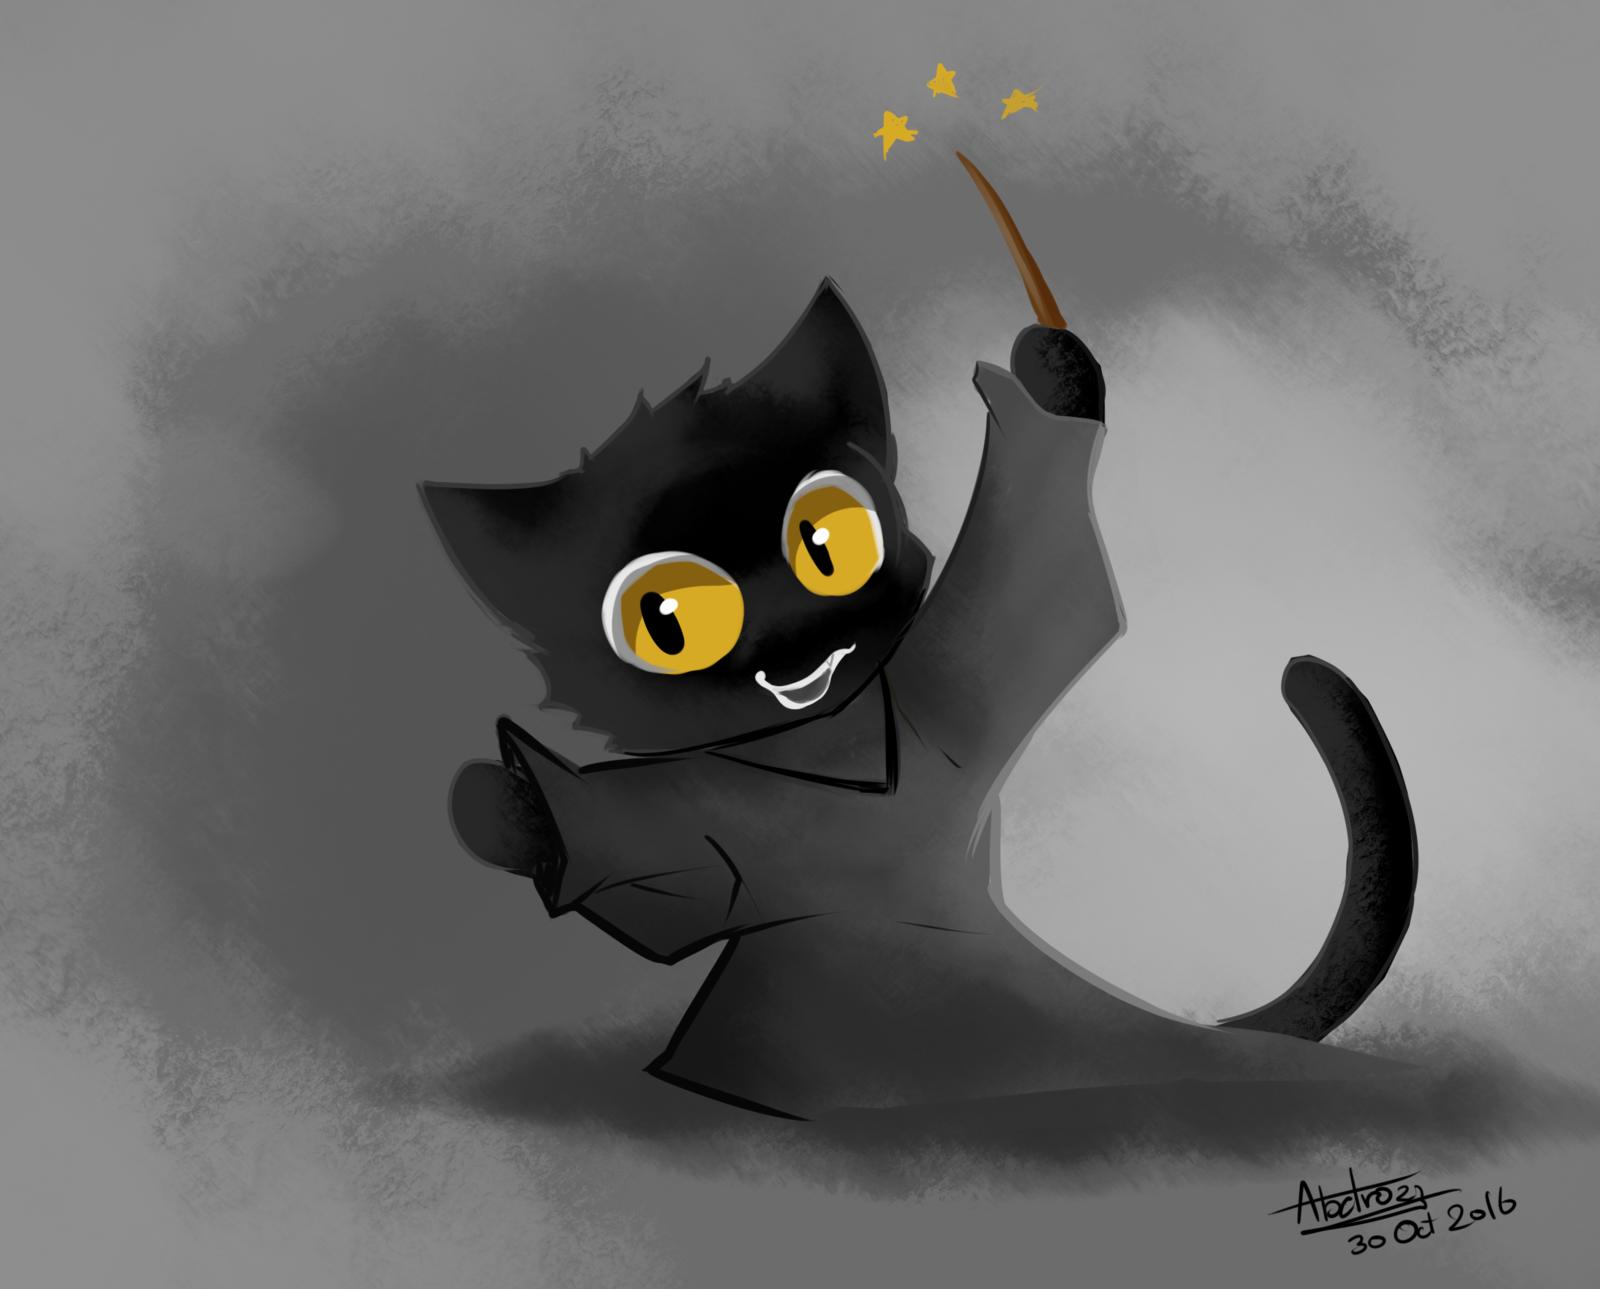 Pin By Izzulirfan On Izzul Irfan Black Cat Halloween Google Doodle Halloween Disney Characters